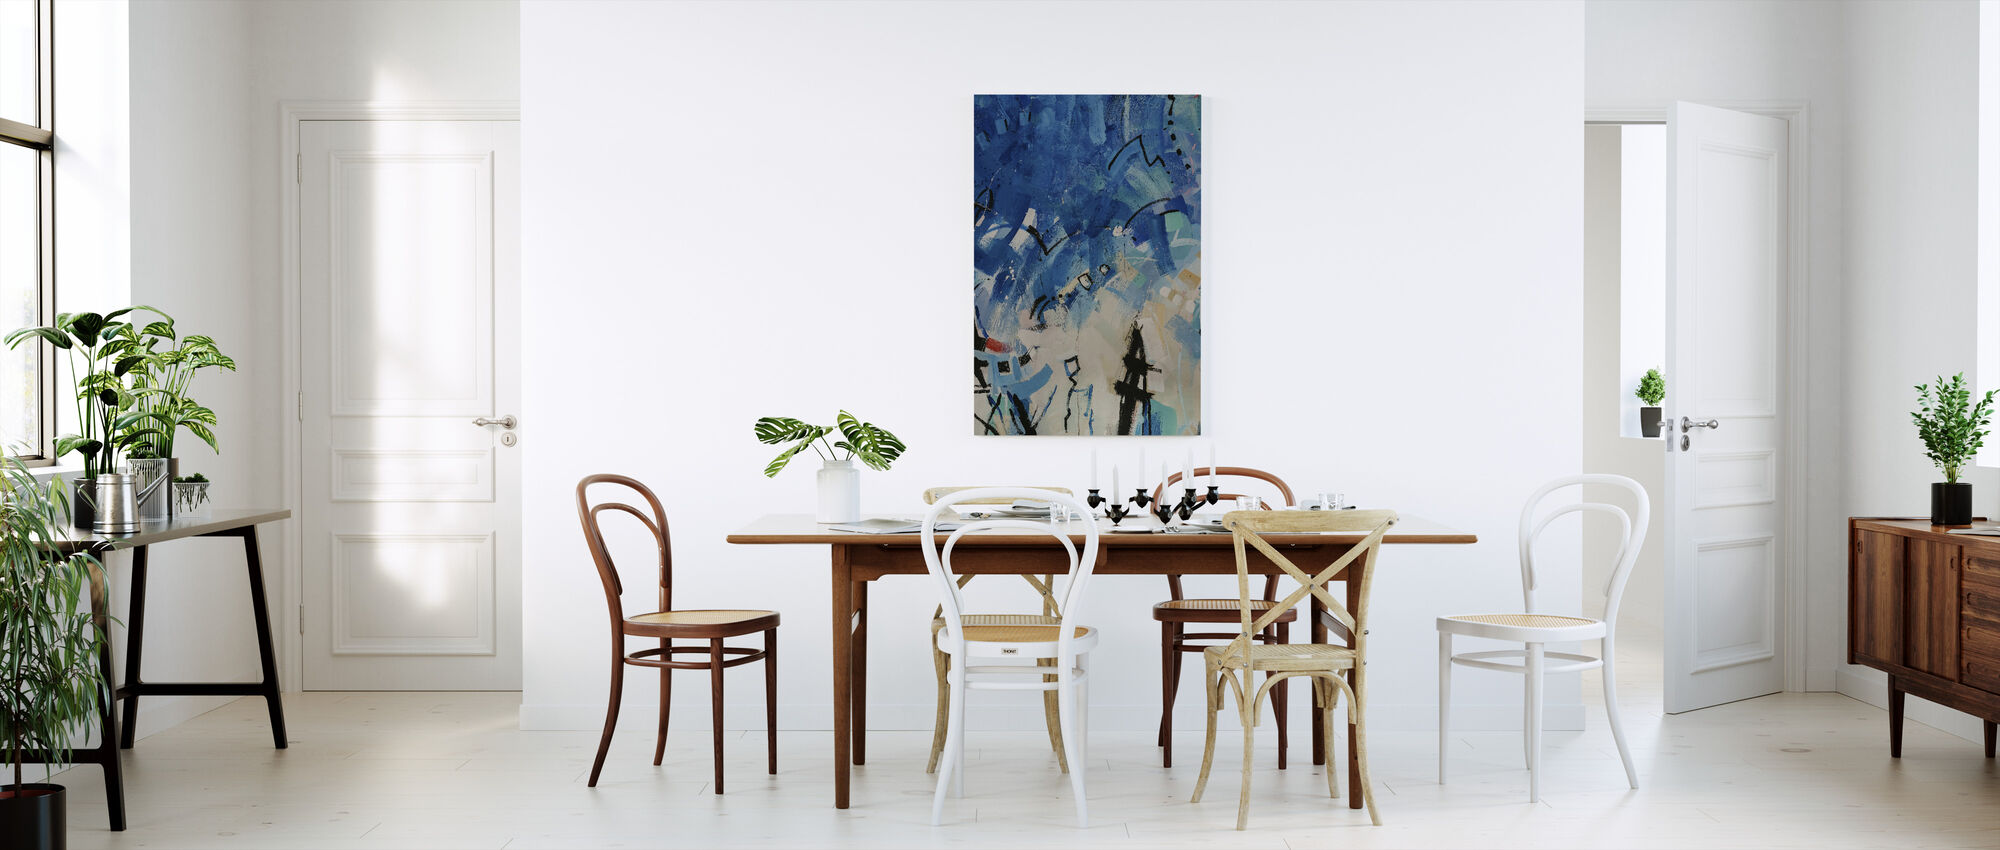 Modern Art Painting - Canvas print - Kitchen